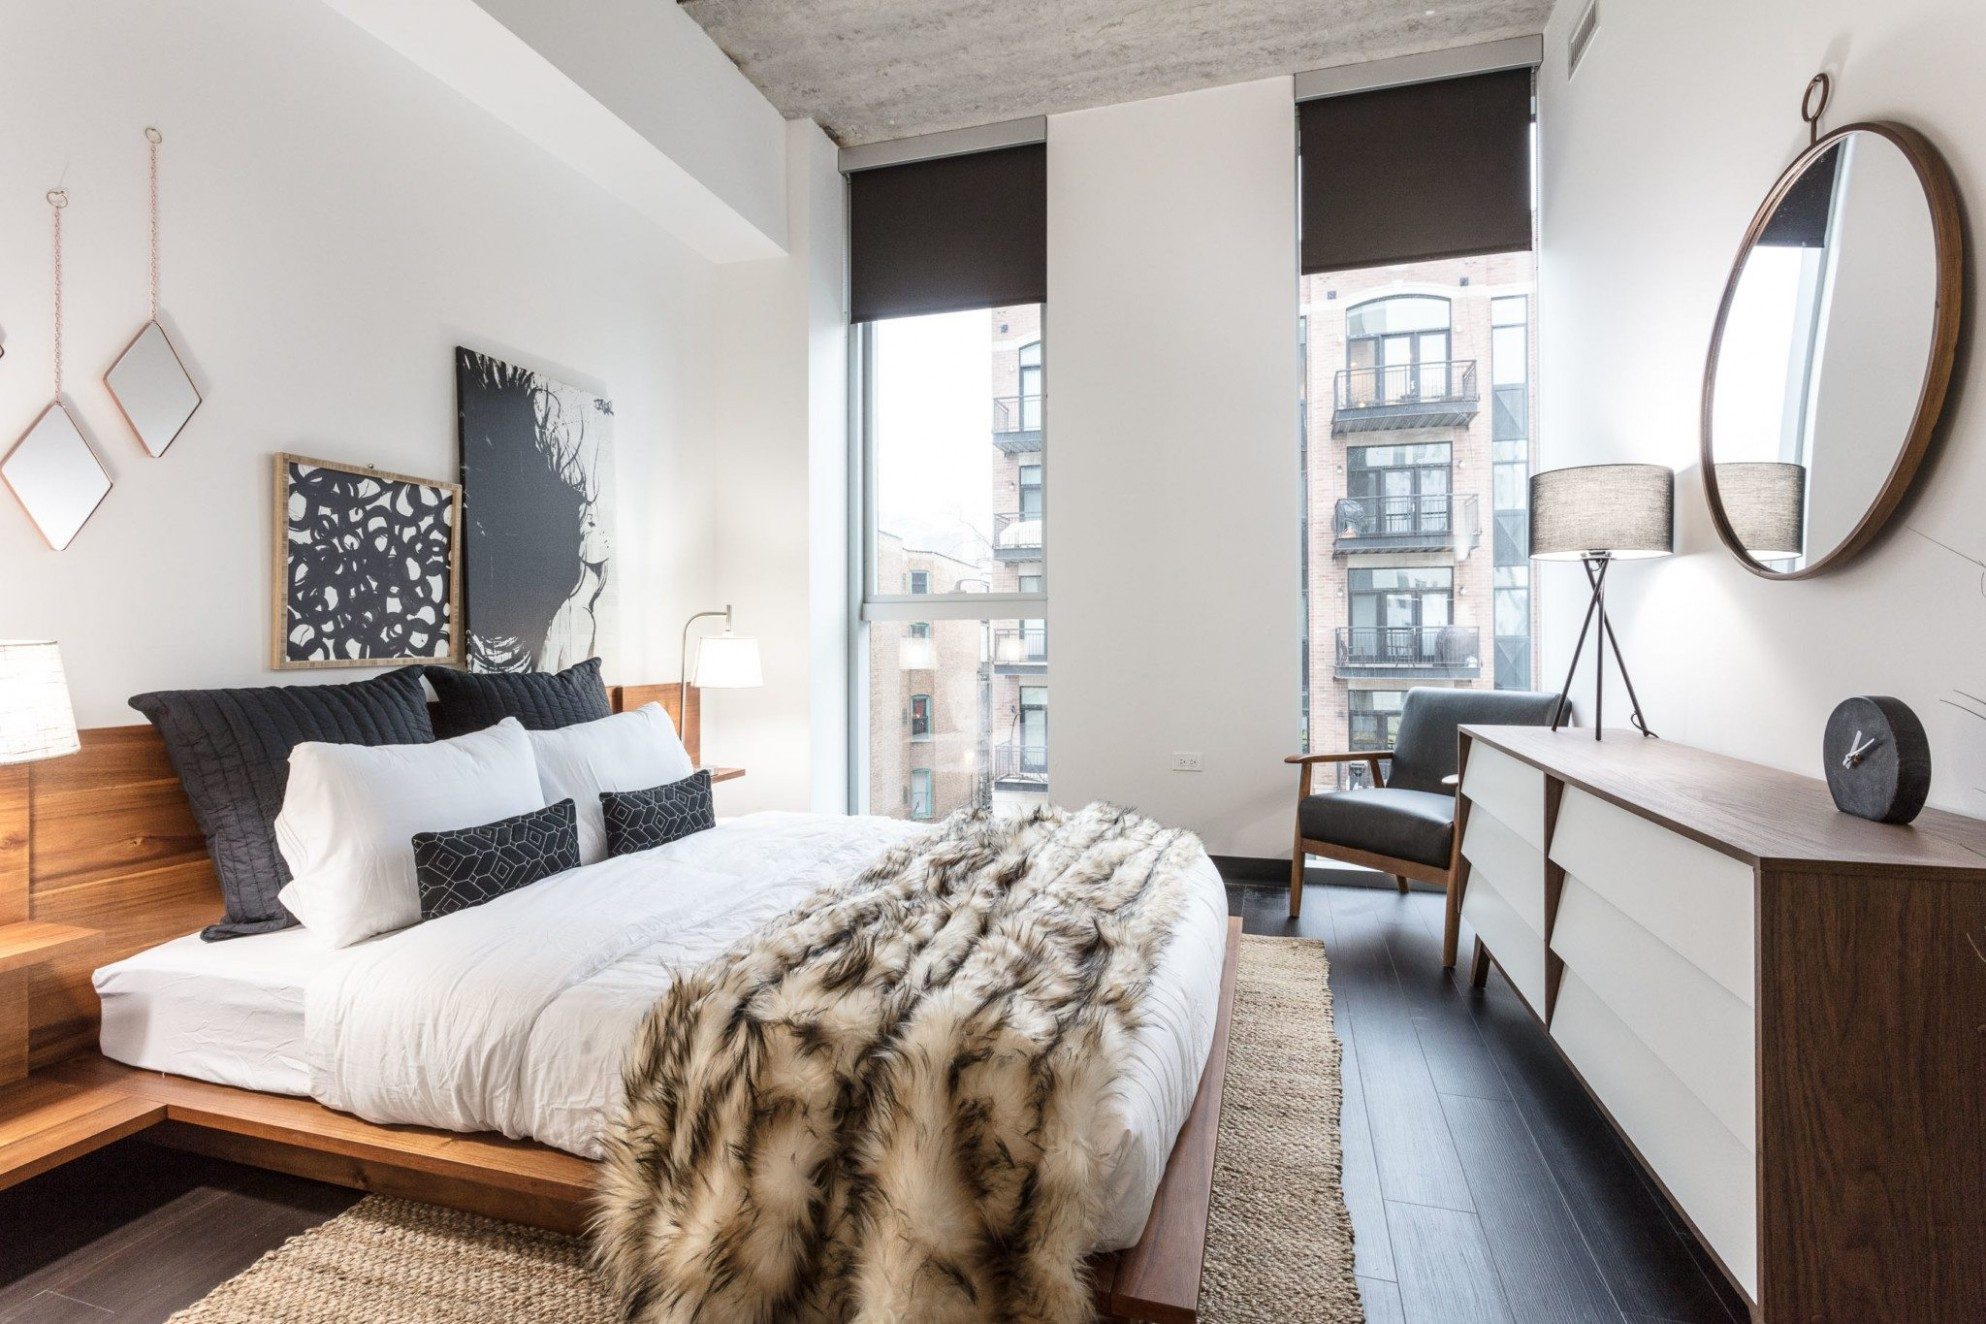 12 Apartment Bedroom Decorating Ideas - Luxury Living - Bedroom Ideas Apartment